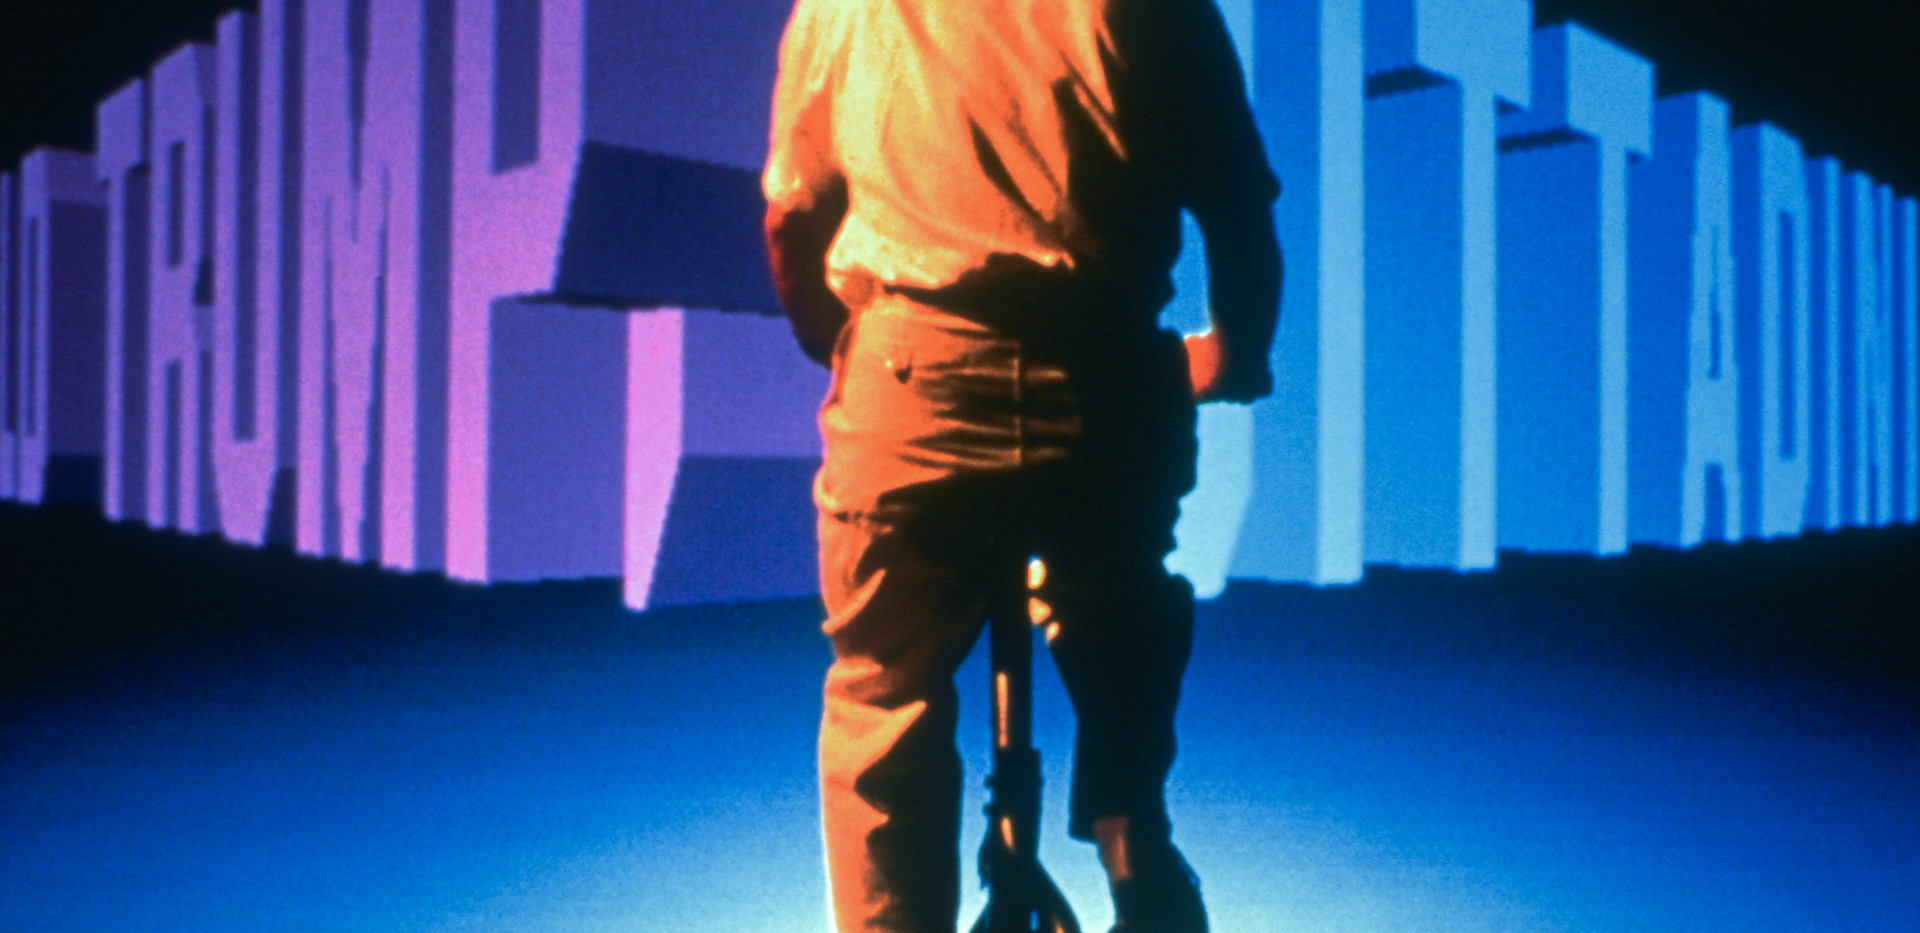 The Legible City (1989‐91)